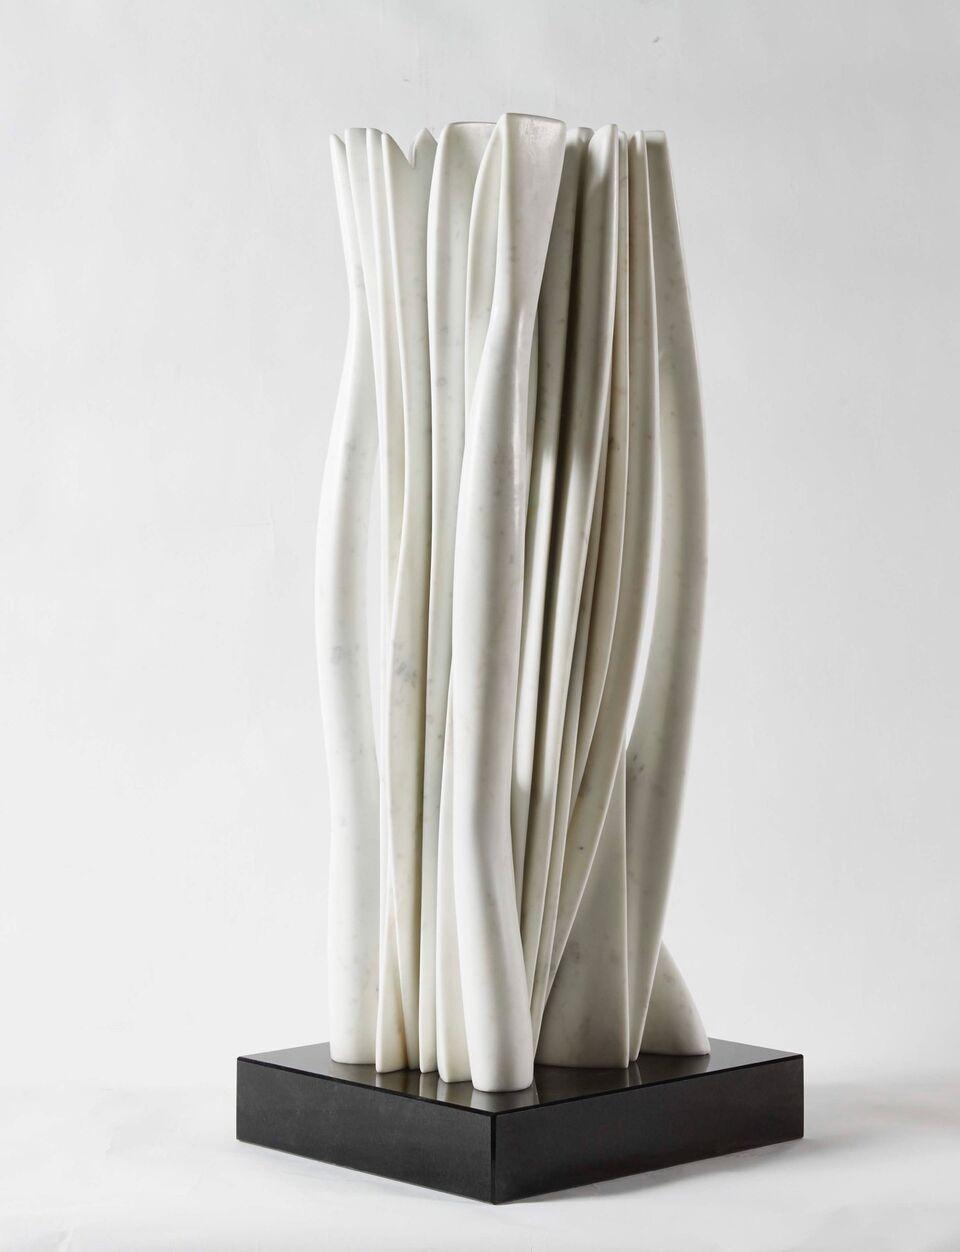 Untitled (2015) - Pablo Atchugarry